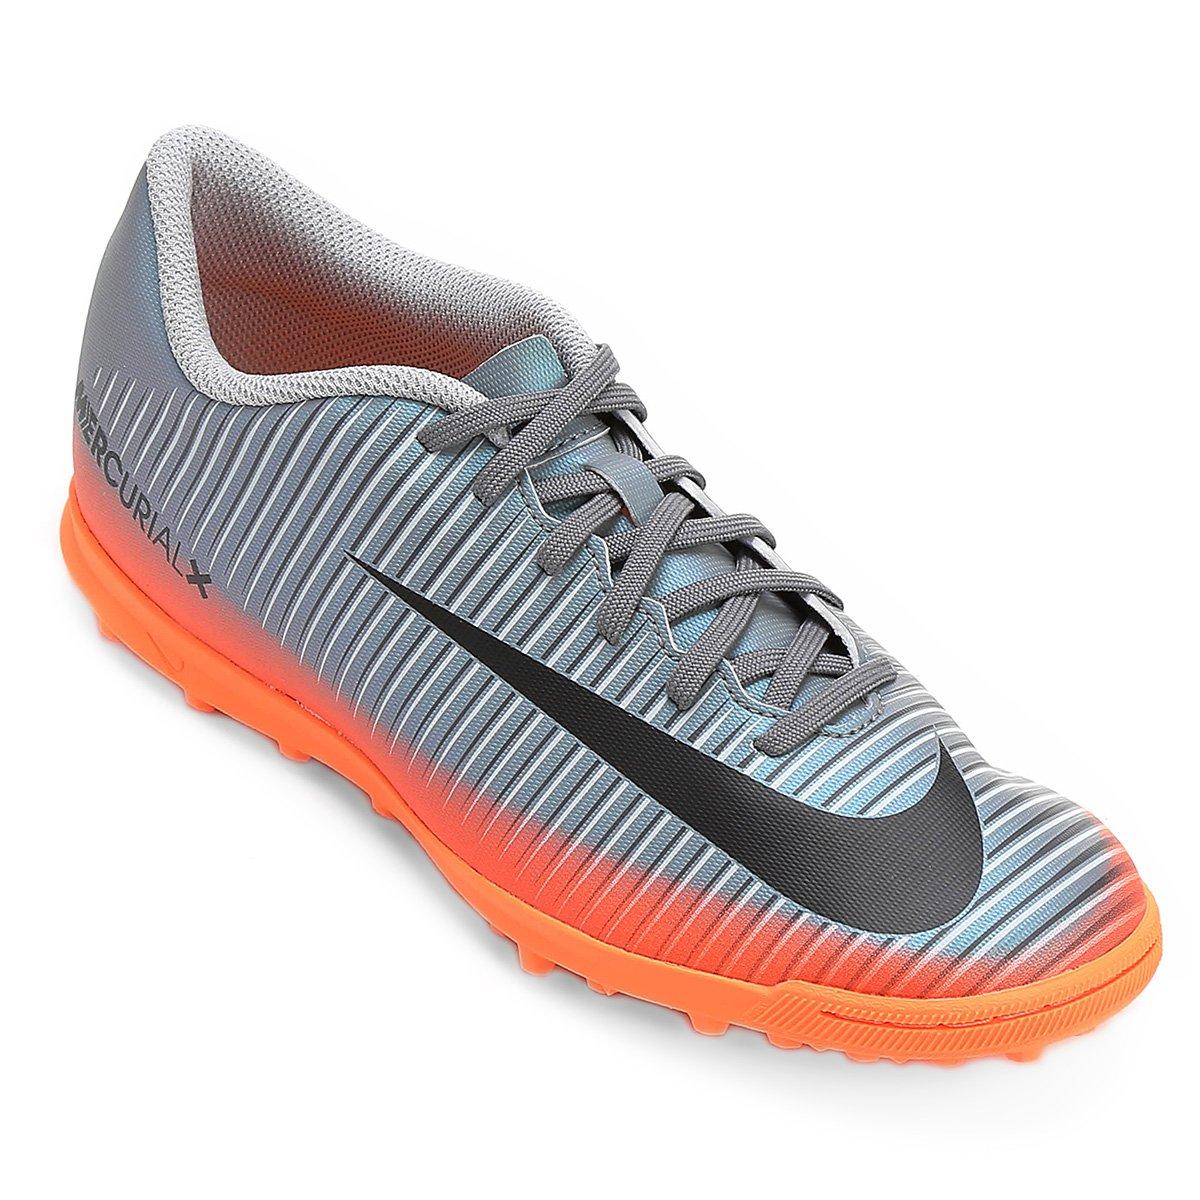 Chuteira Society Nike Mercurial X Vortex 3 CR7 TF - Compre Agora ... 99307c1d4fabe